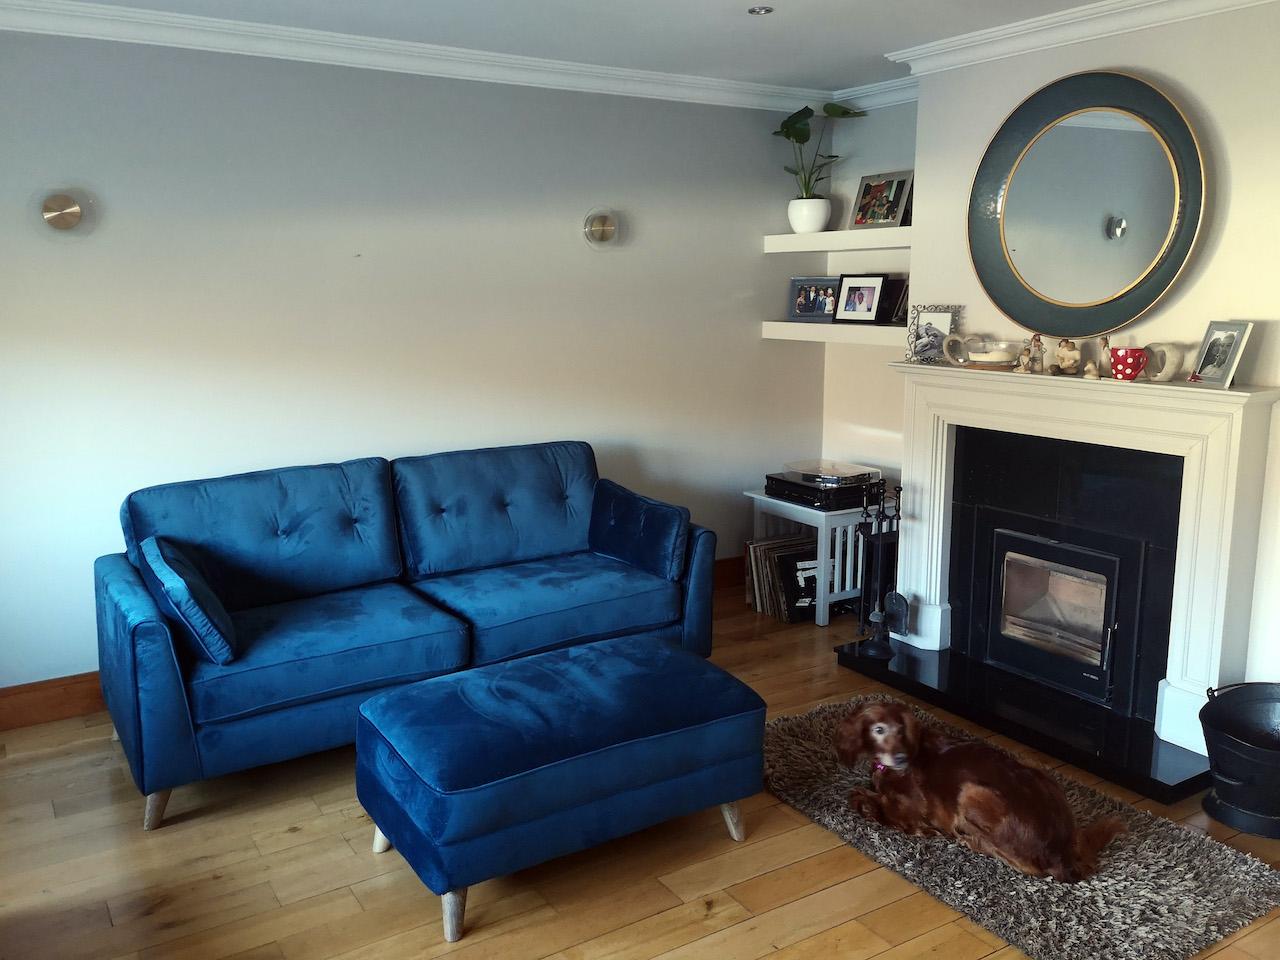 Navy blue Magnus sofa + footstool